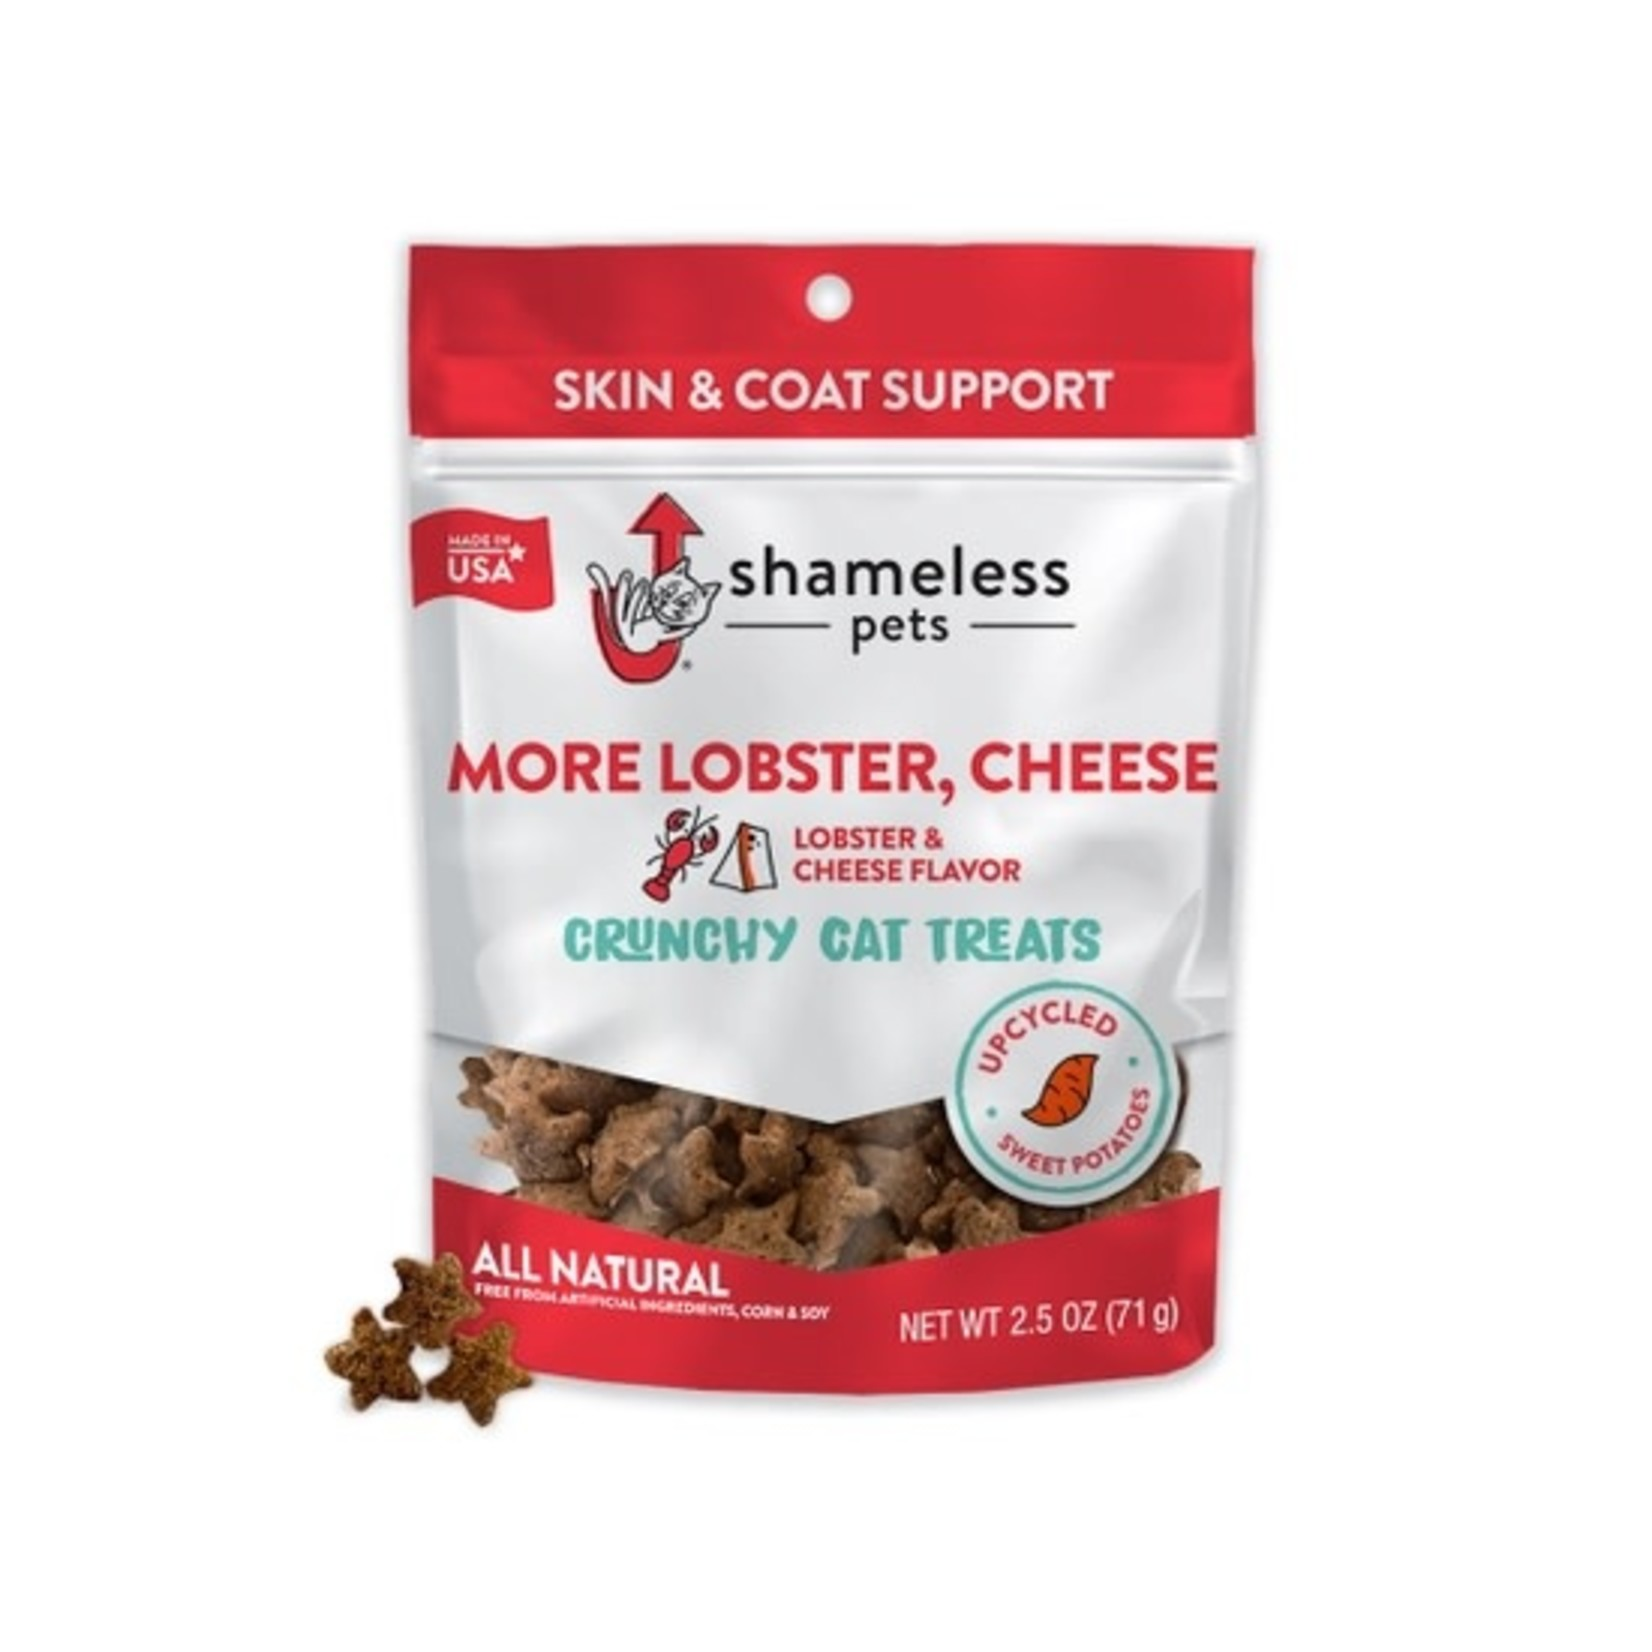 Shameless Pets Shameless Pets Cat More Lobster, Cheese Crunchy Cat Treats 2.5 OZ